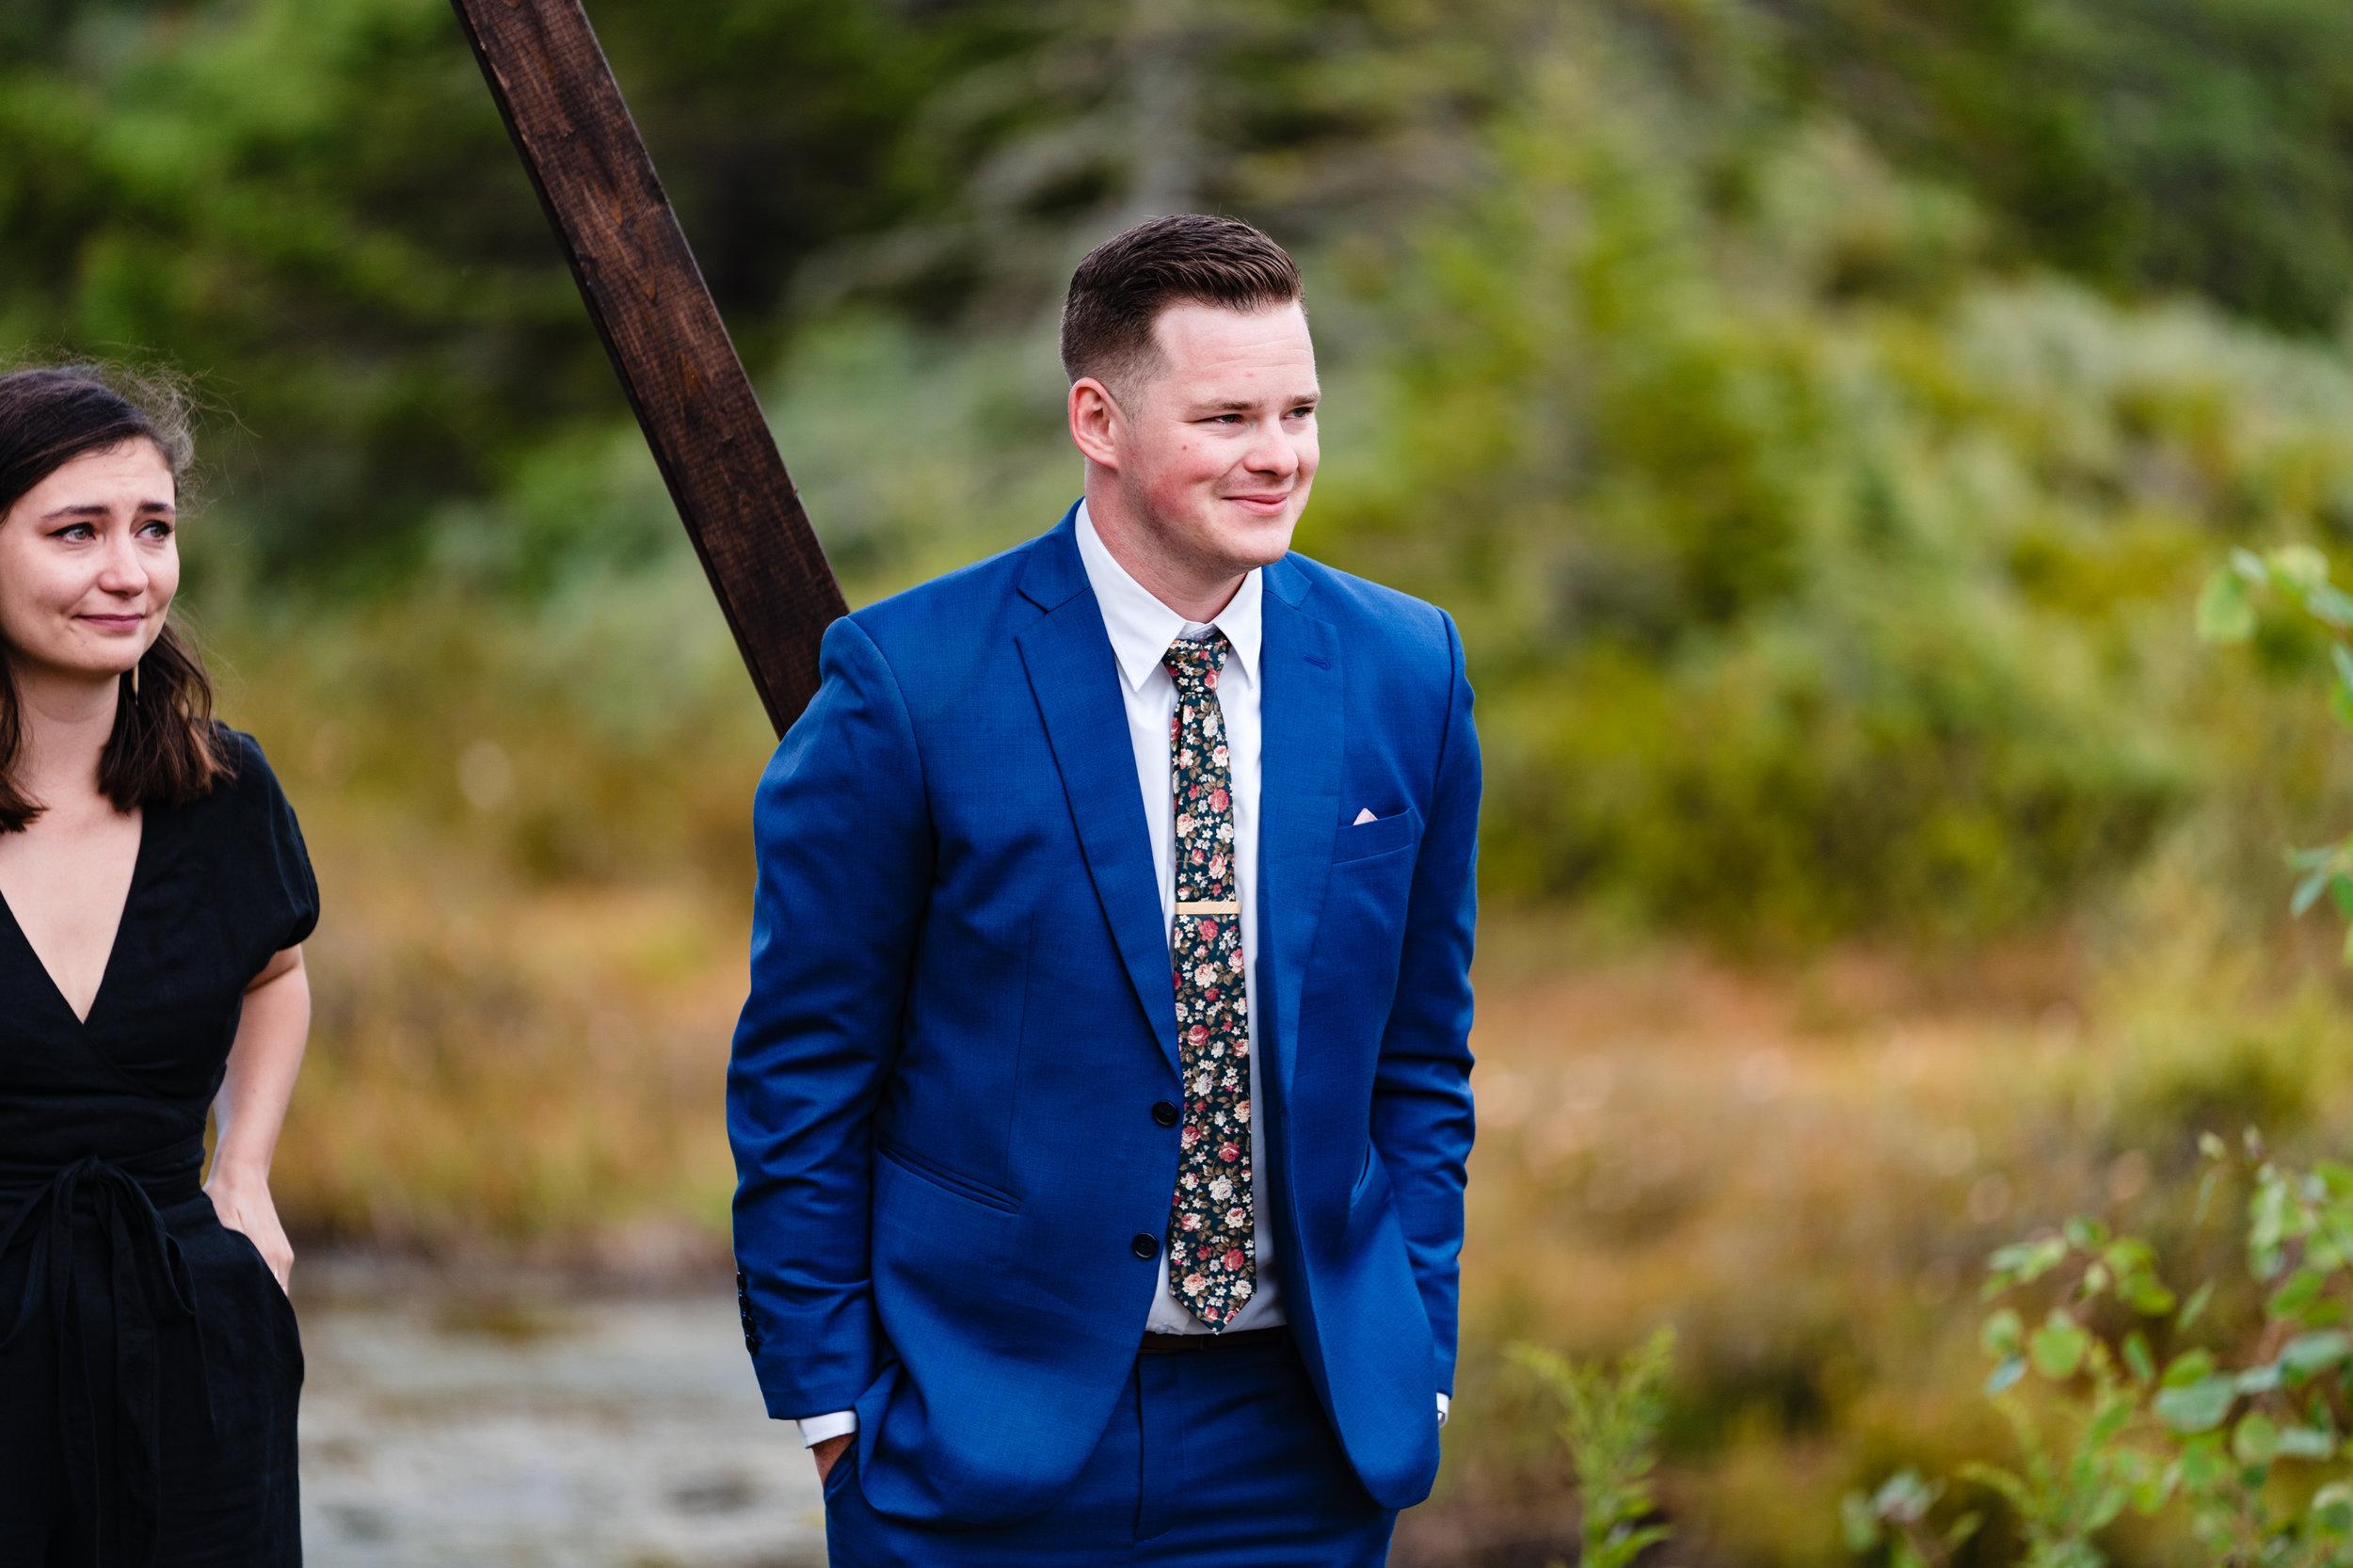 Janelle-Mitch-Halifax-Wedding-Nova-Scotia-Photography (103 of 163).jpg